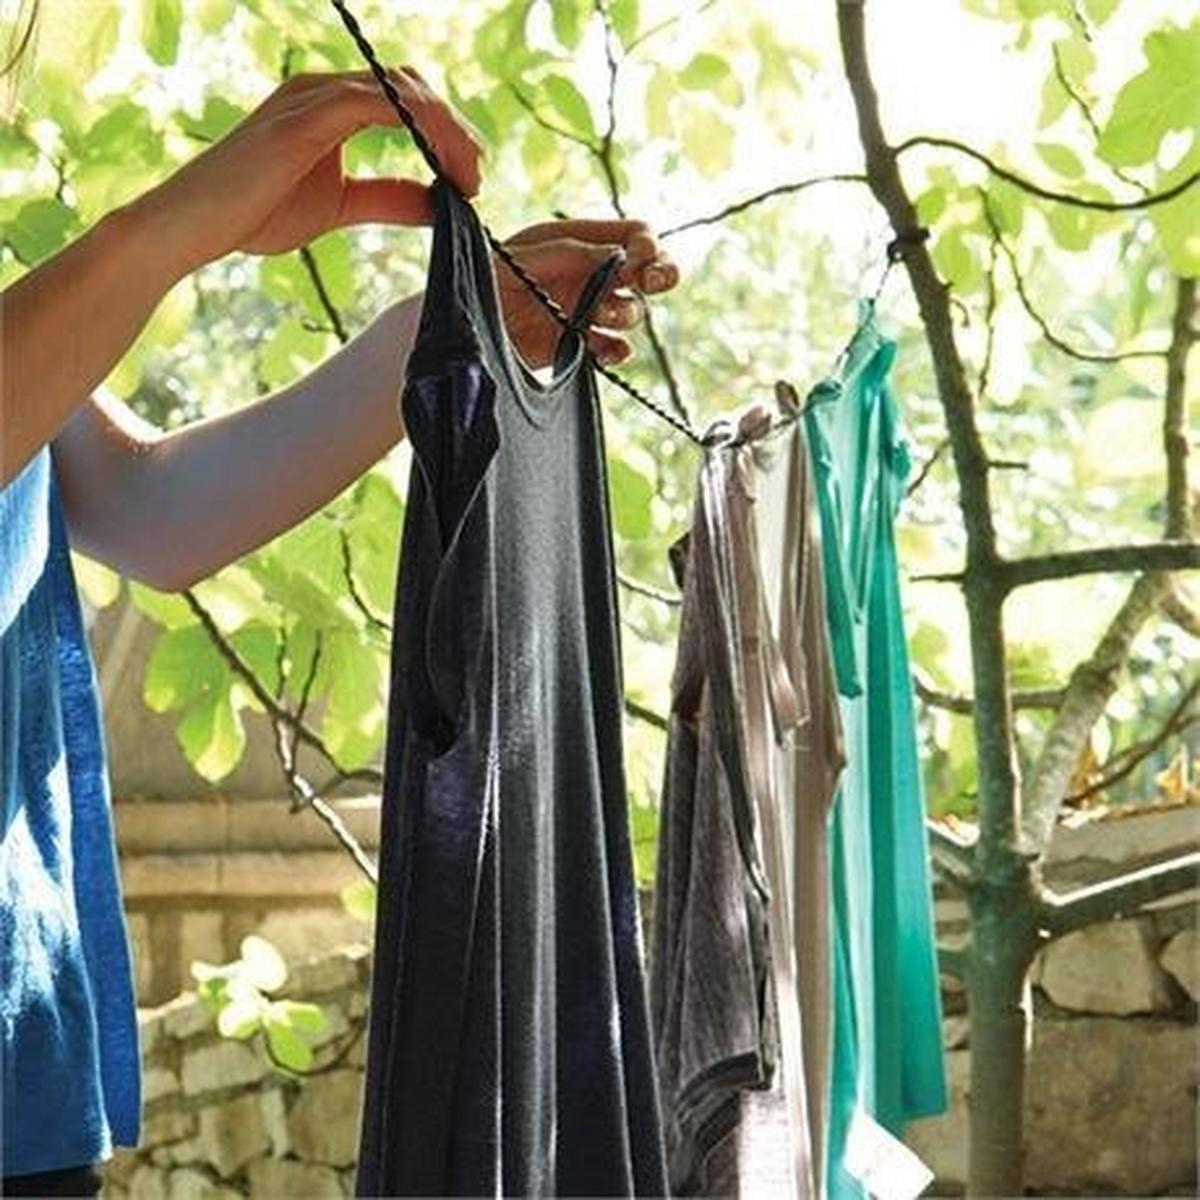 Lifeventure Travel Clothes Line